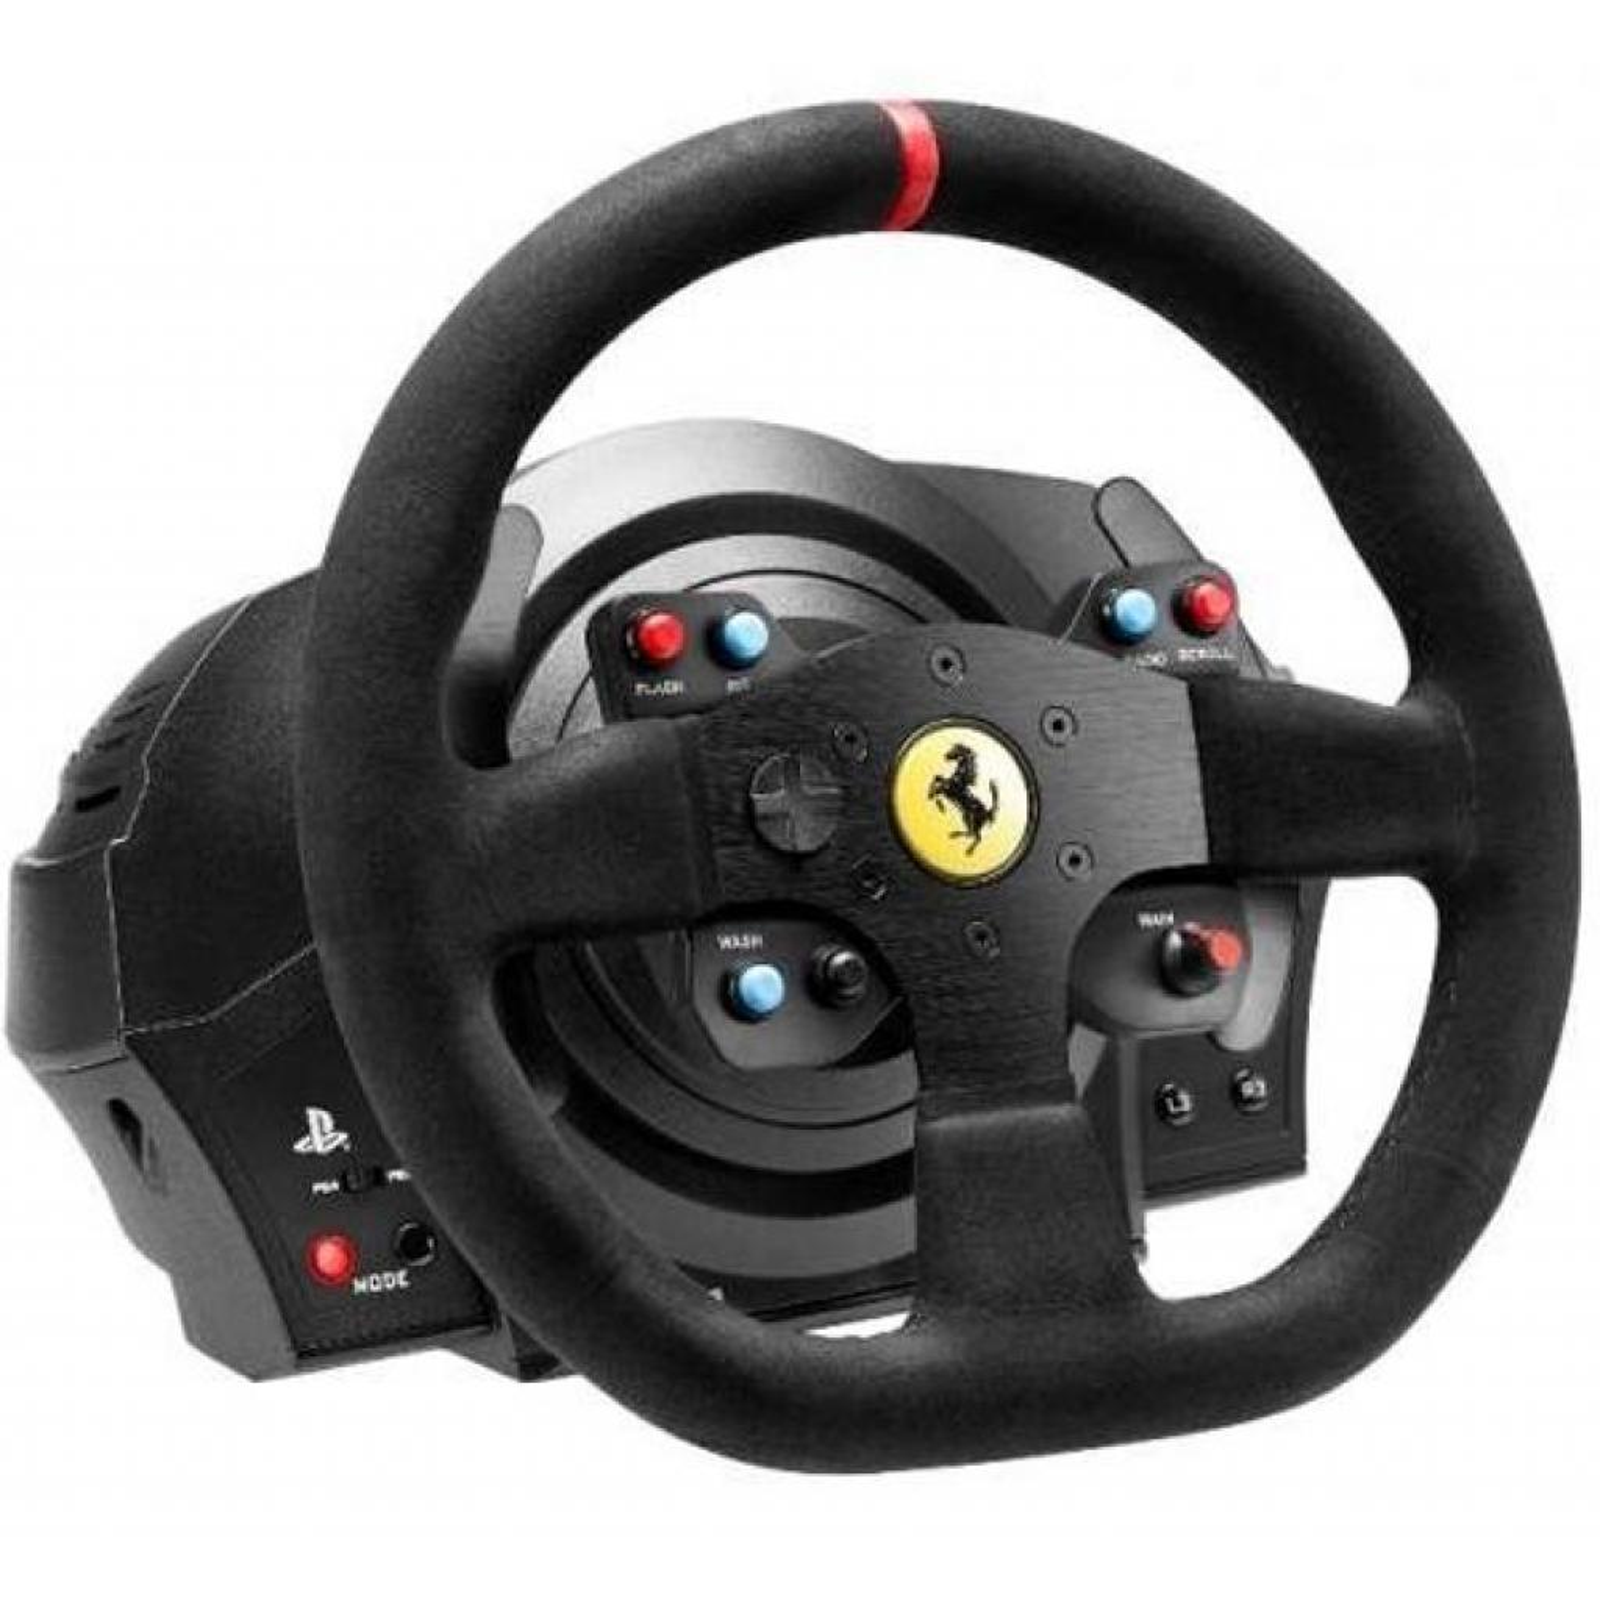 Руль ThrustMaster PC/PS4®/PS3® T300 Ferrari Integral RW Alcantara edition (4160652) изображение 3